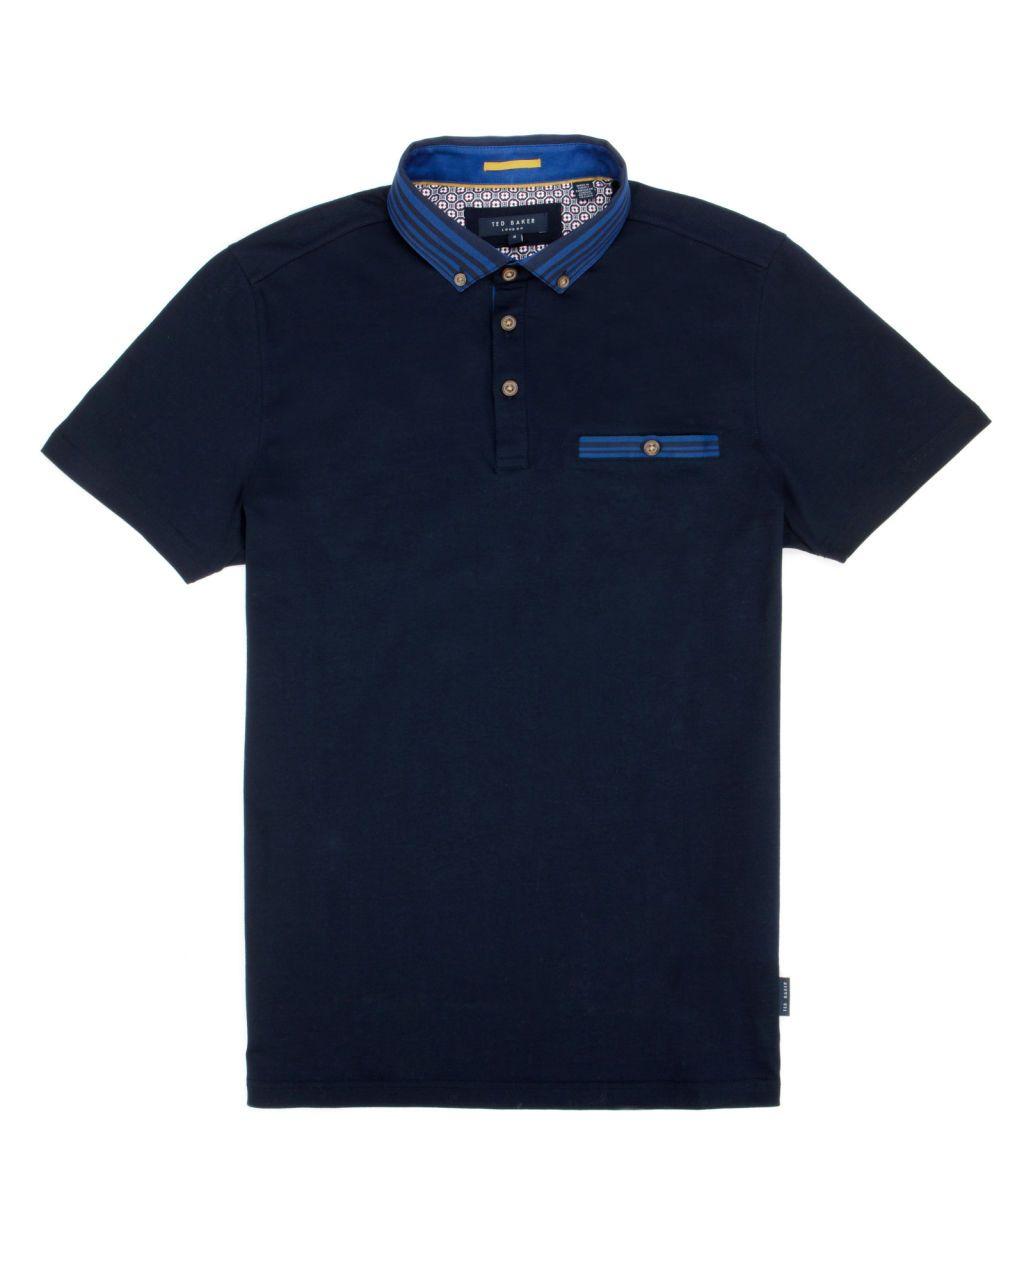 Gros grain collar polo - Navy | Tops & T-shirts | Ted Baker UK